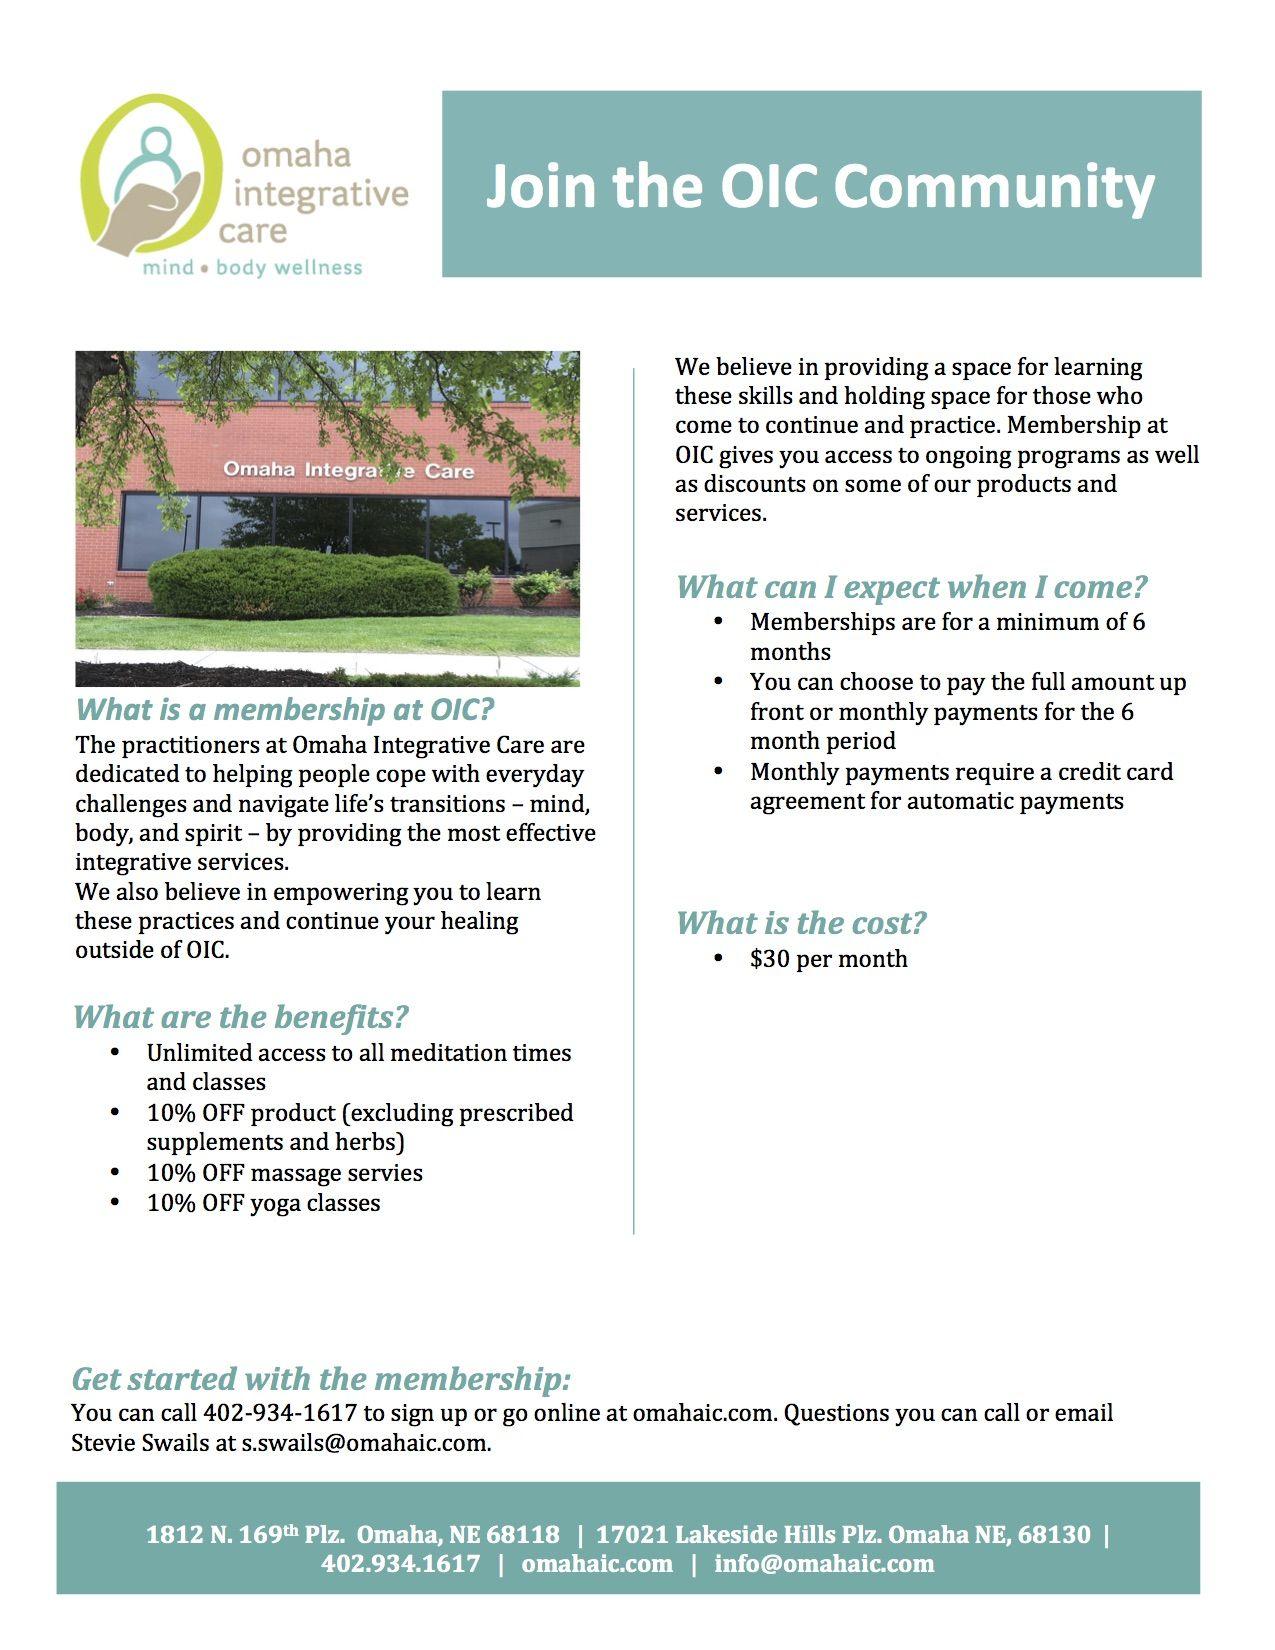 Memberships At Oic Wellness Mindfulness Community